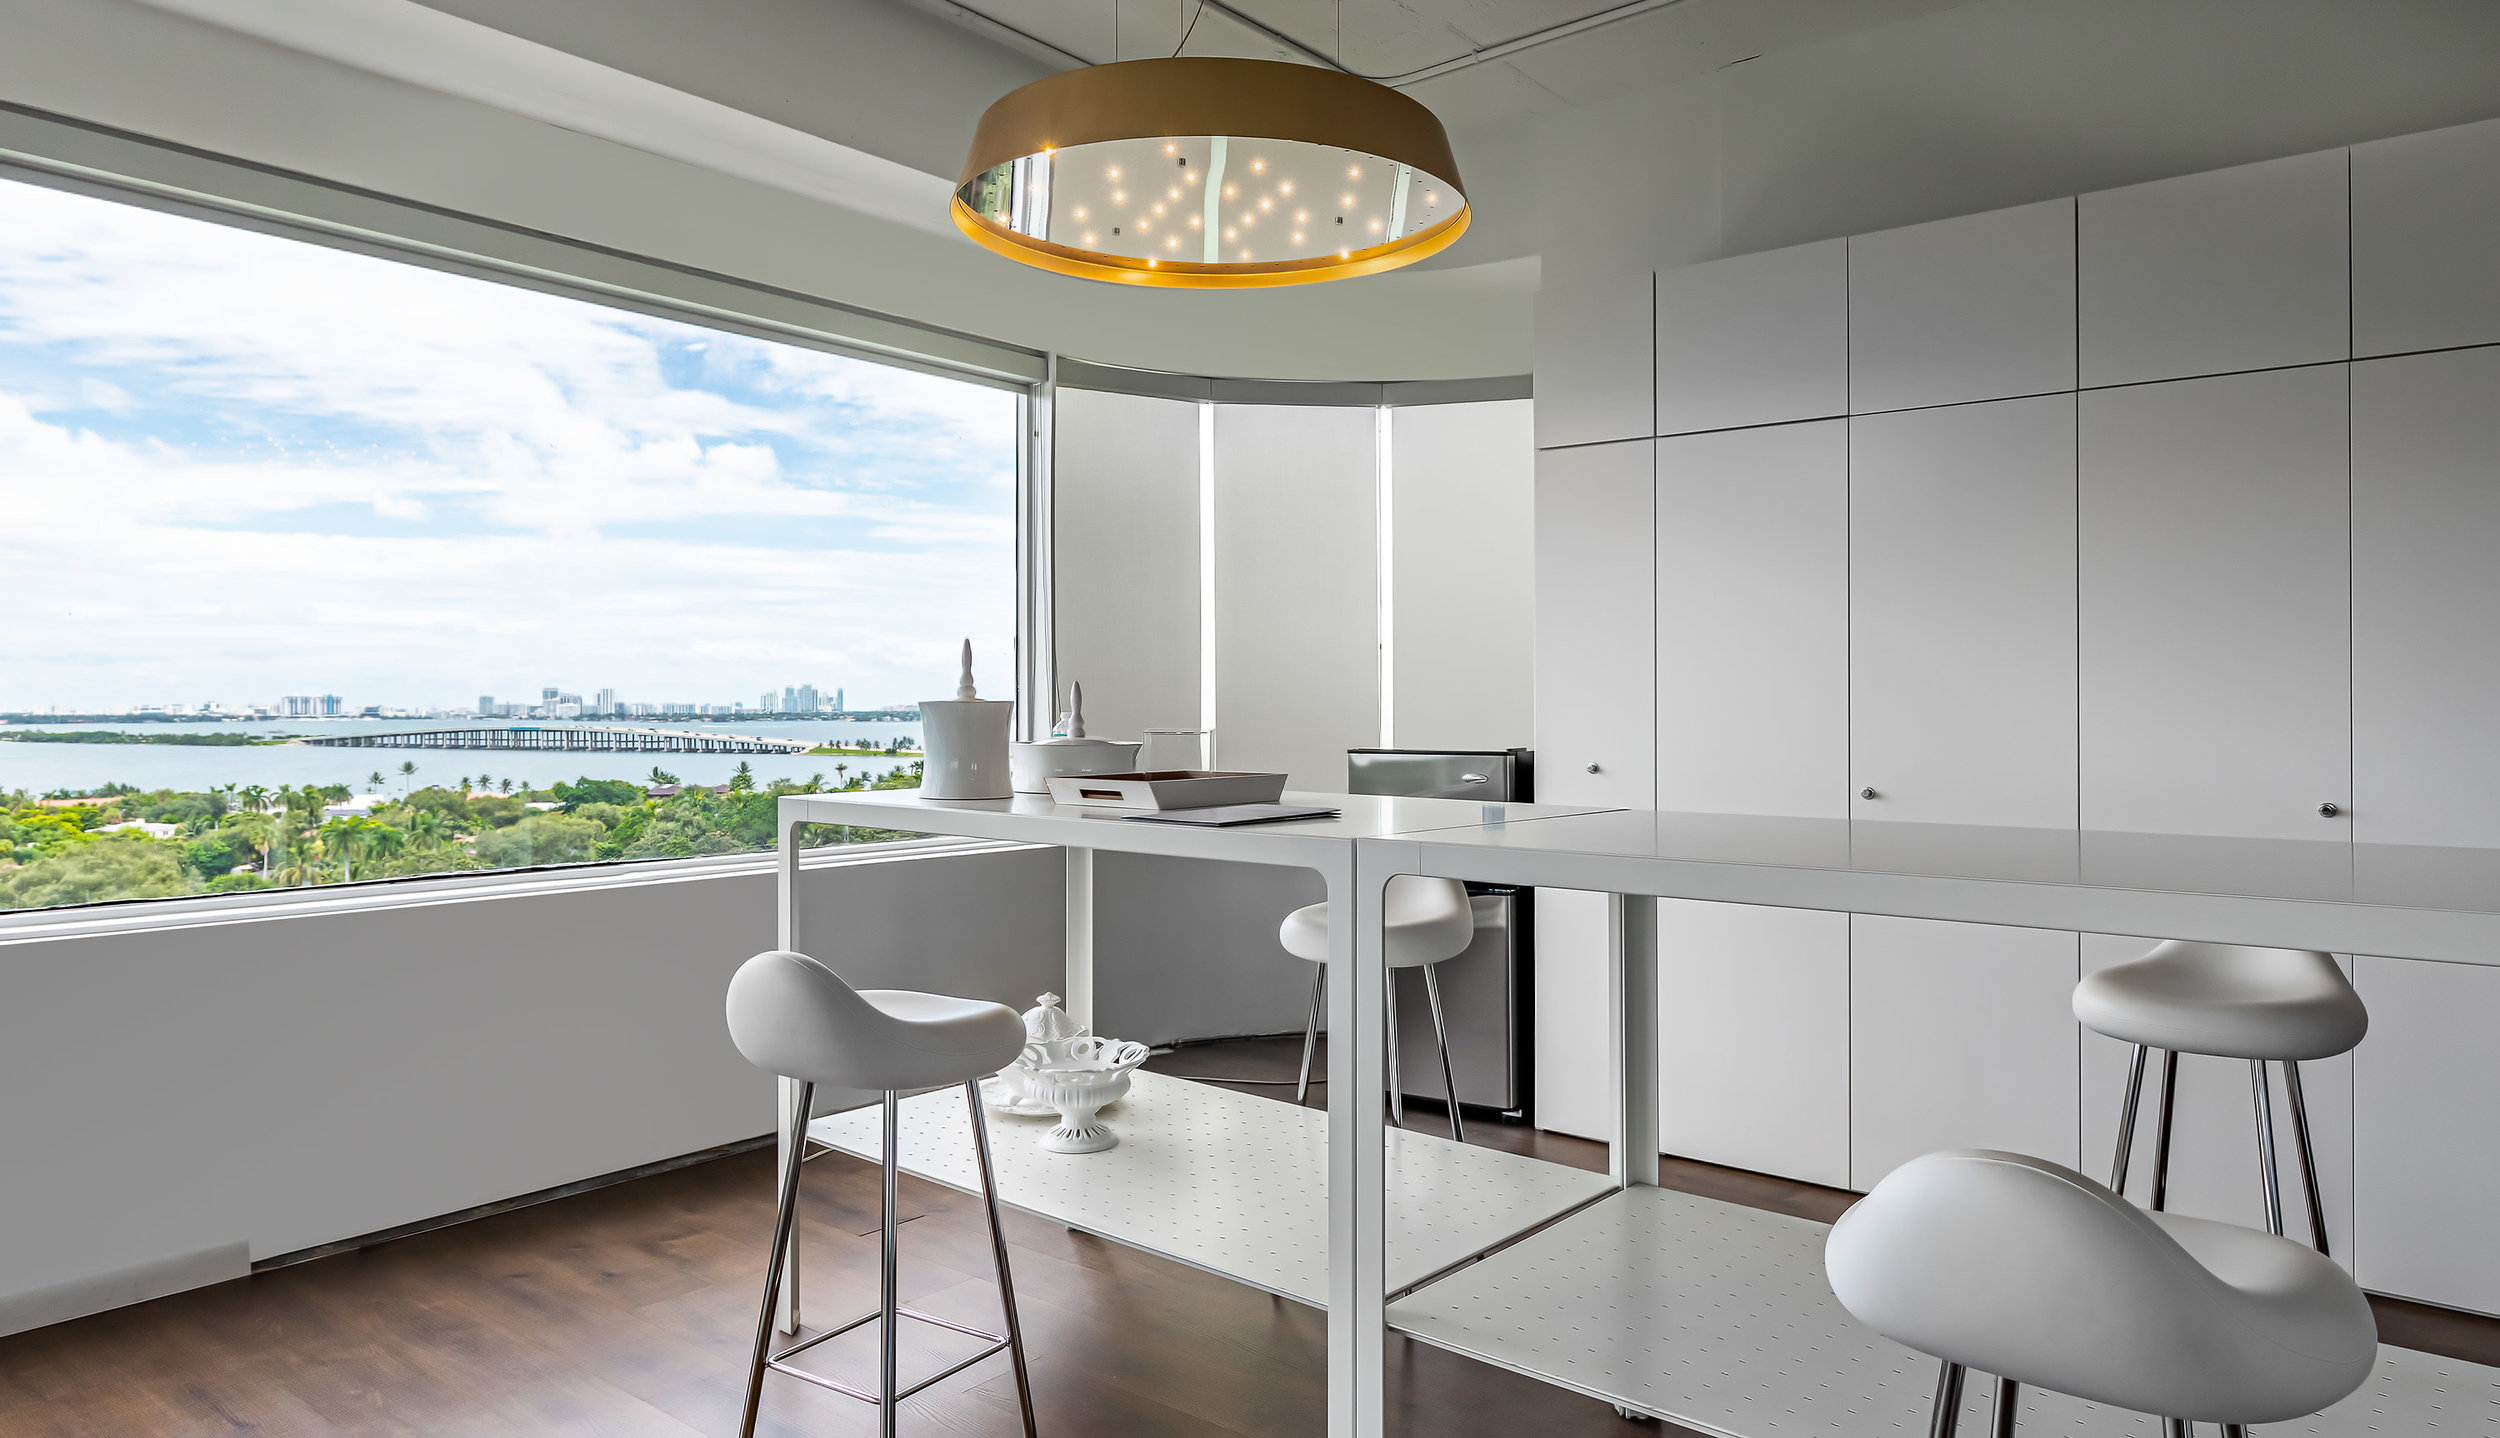 Office Suite - 4770 Biscayne Blvd, Miami